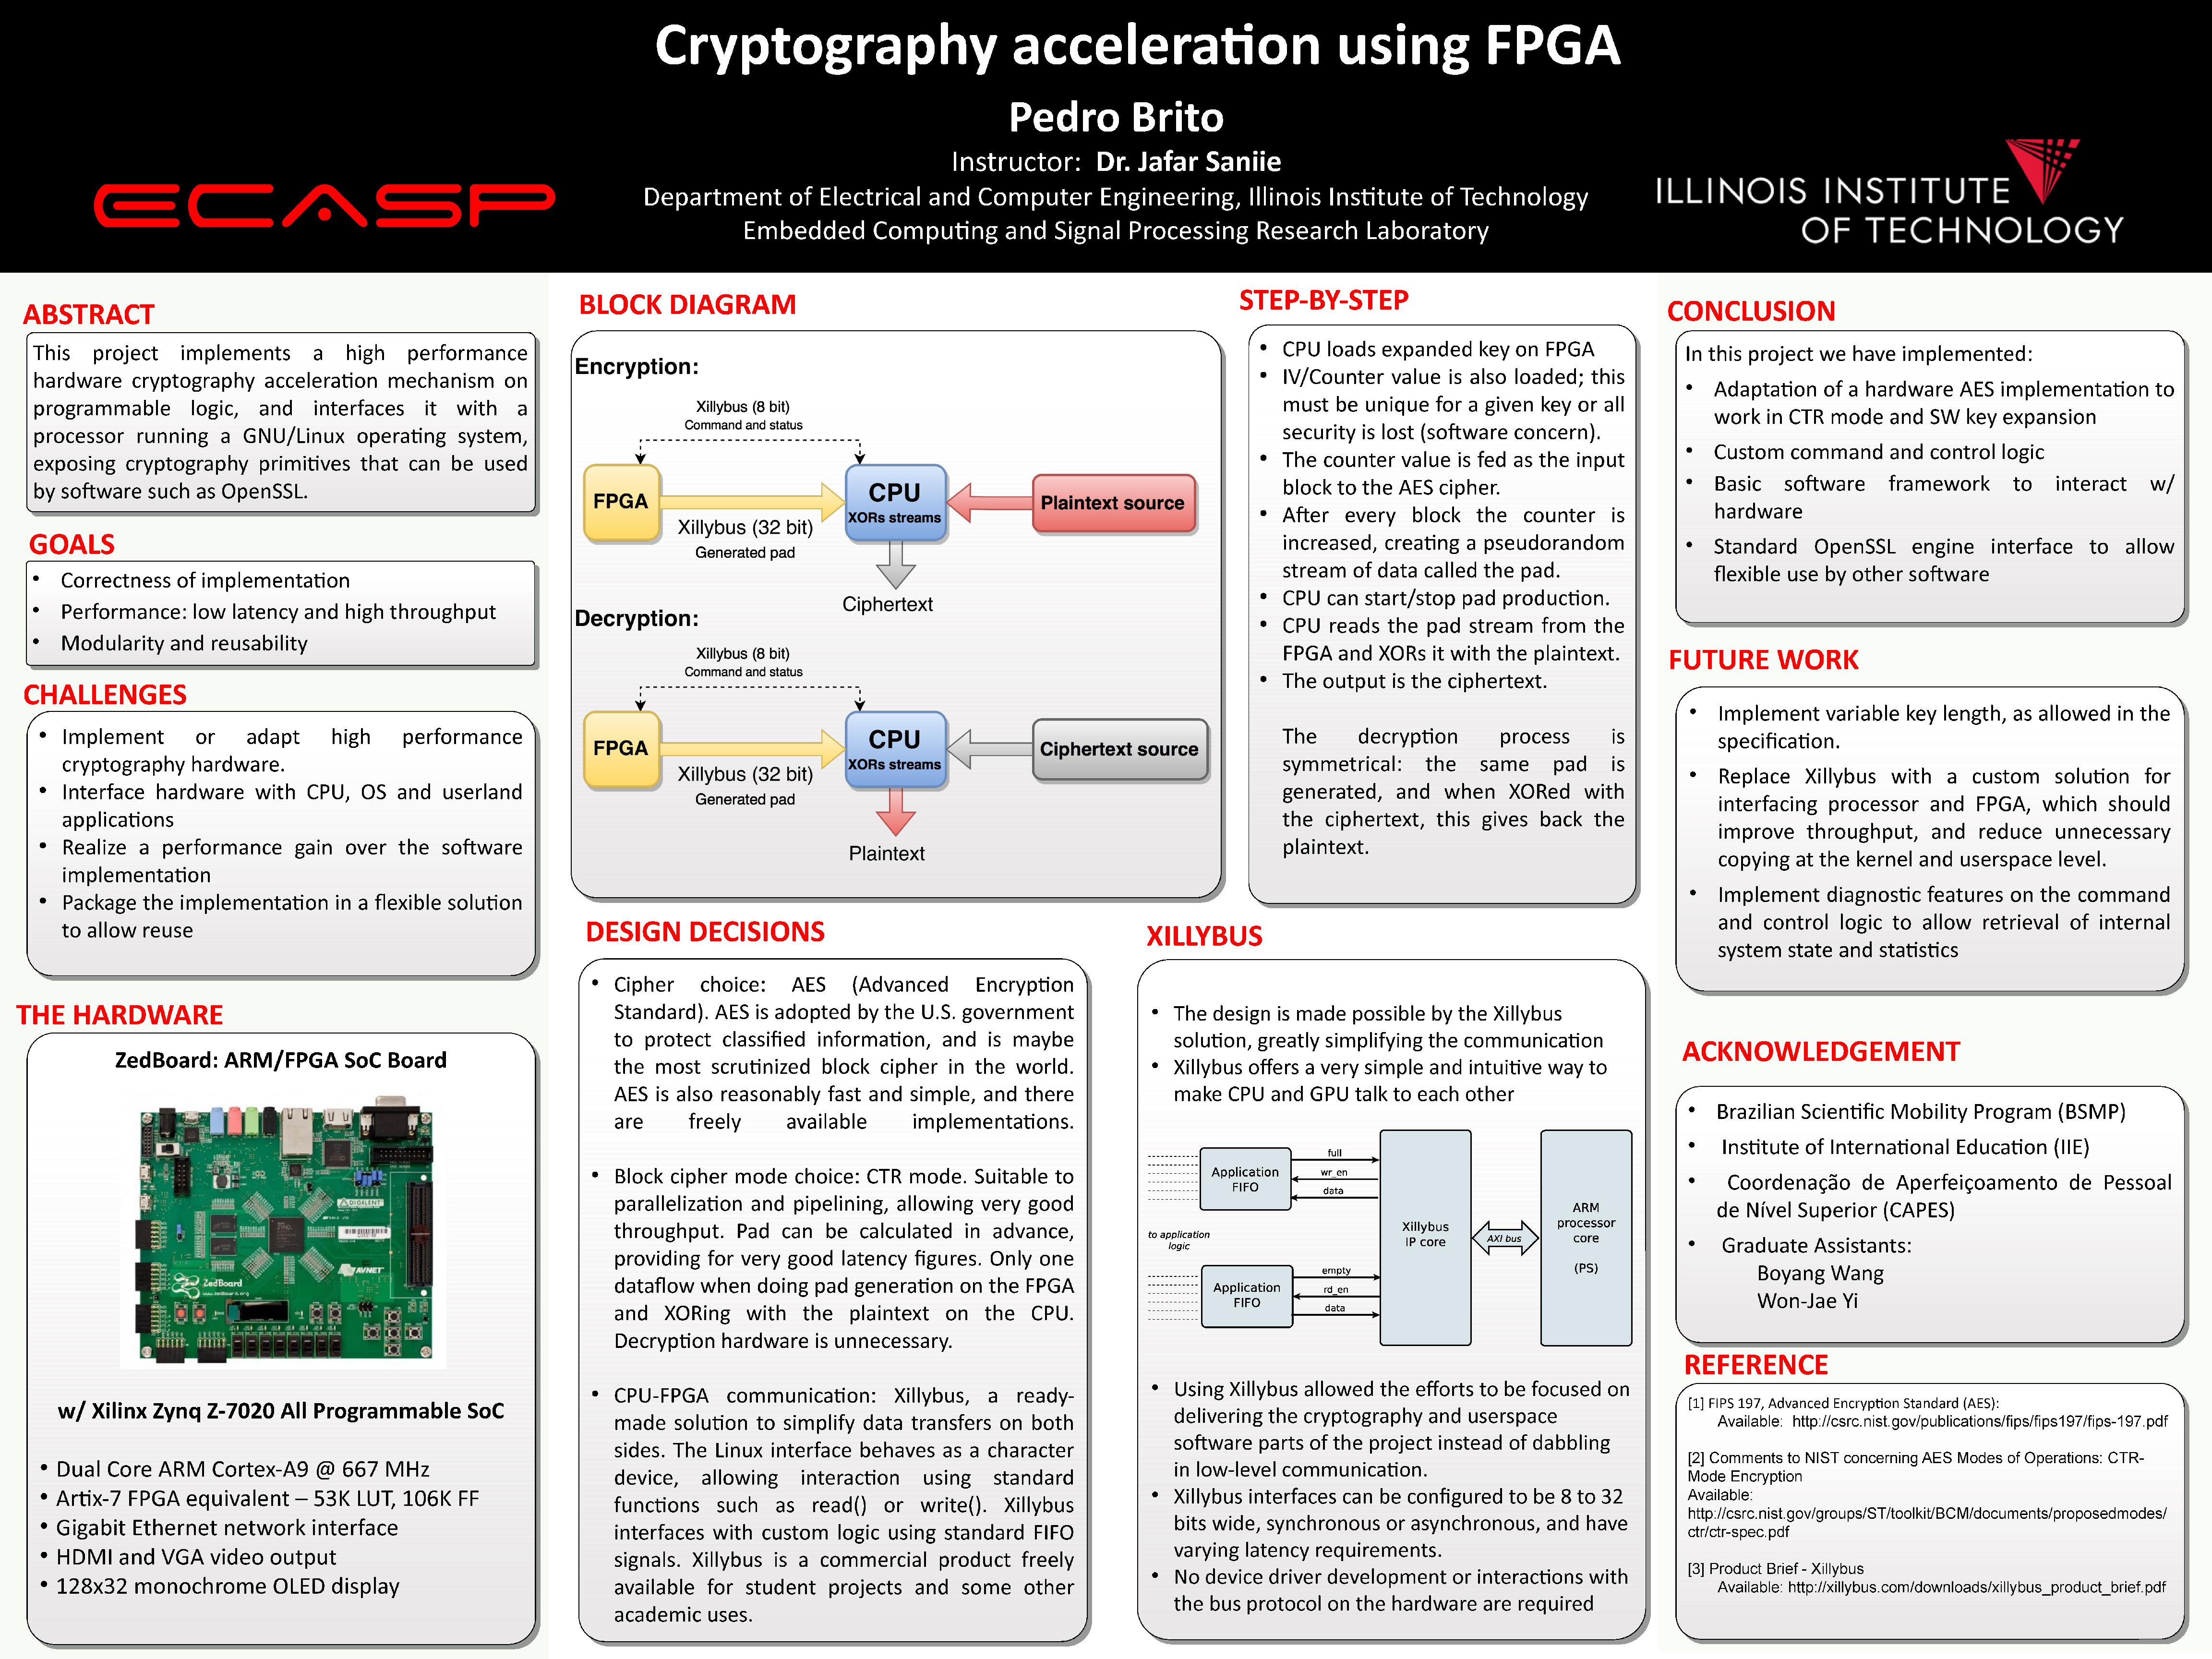 bsmp2016_crypto.jpg